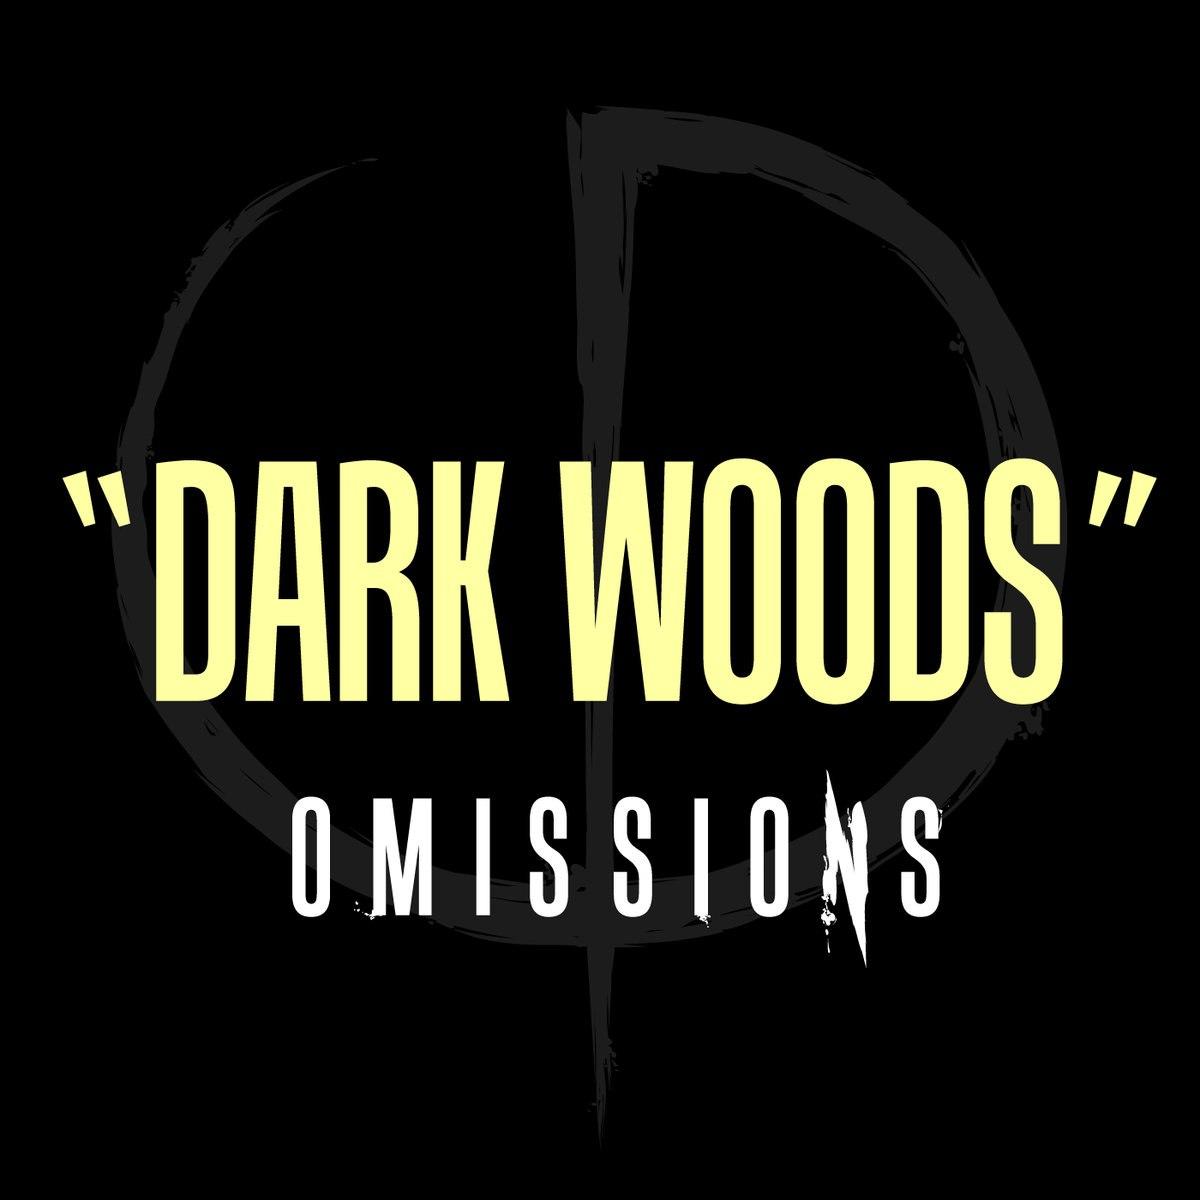 Omissions - Dark Woods [single] (2016)